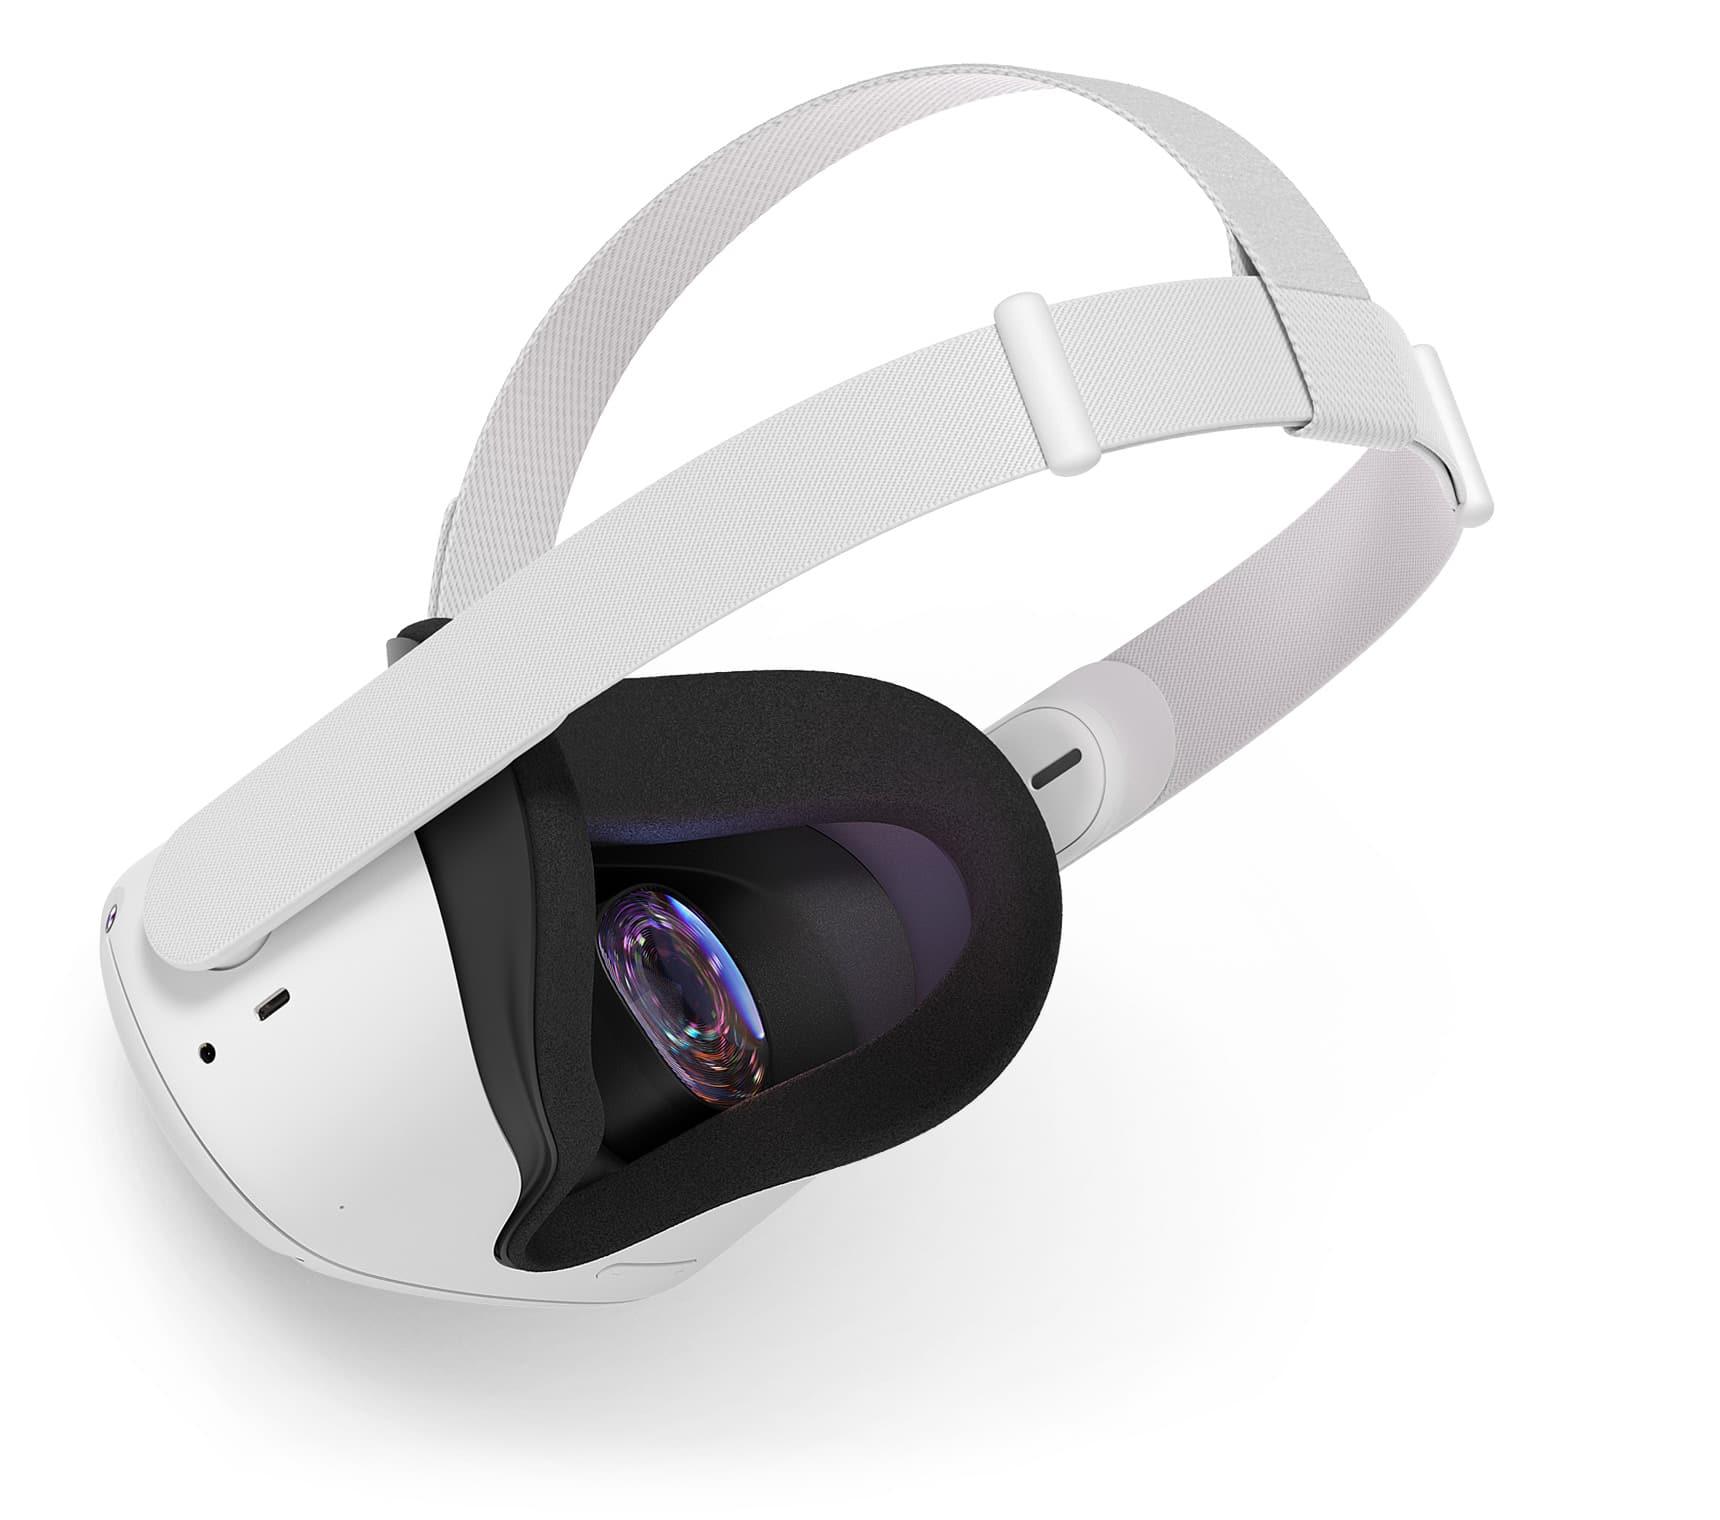 Visore realtà aumentata oculus quest senza fili